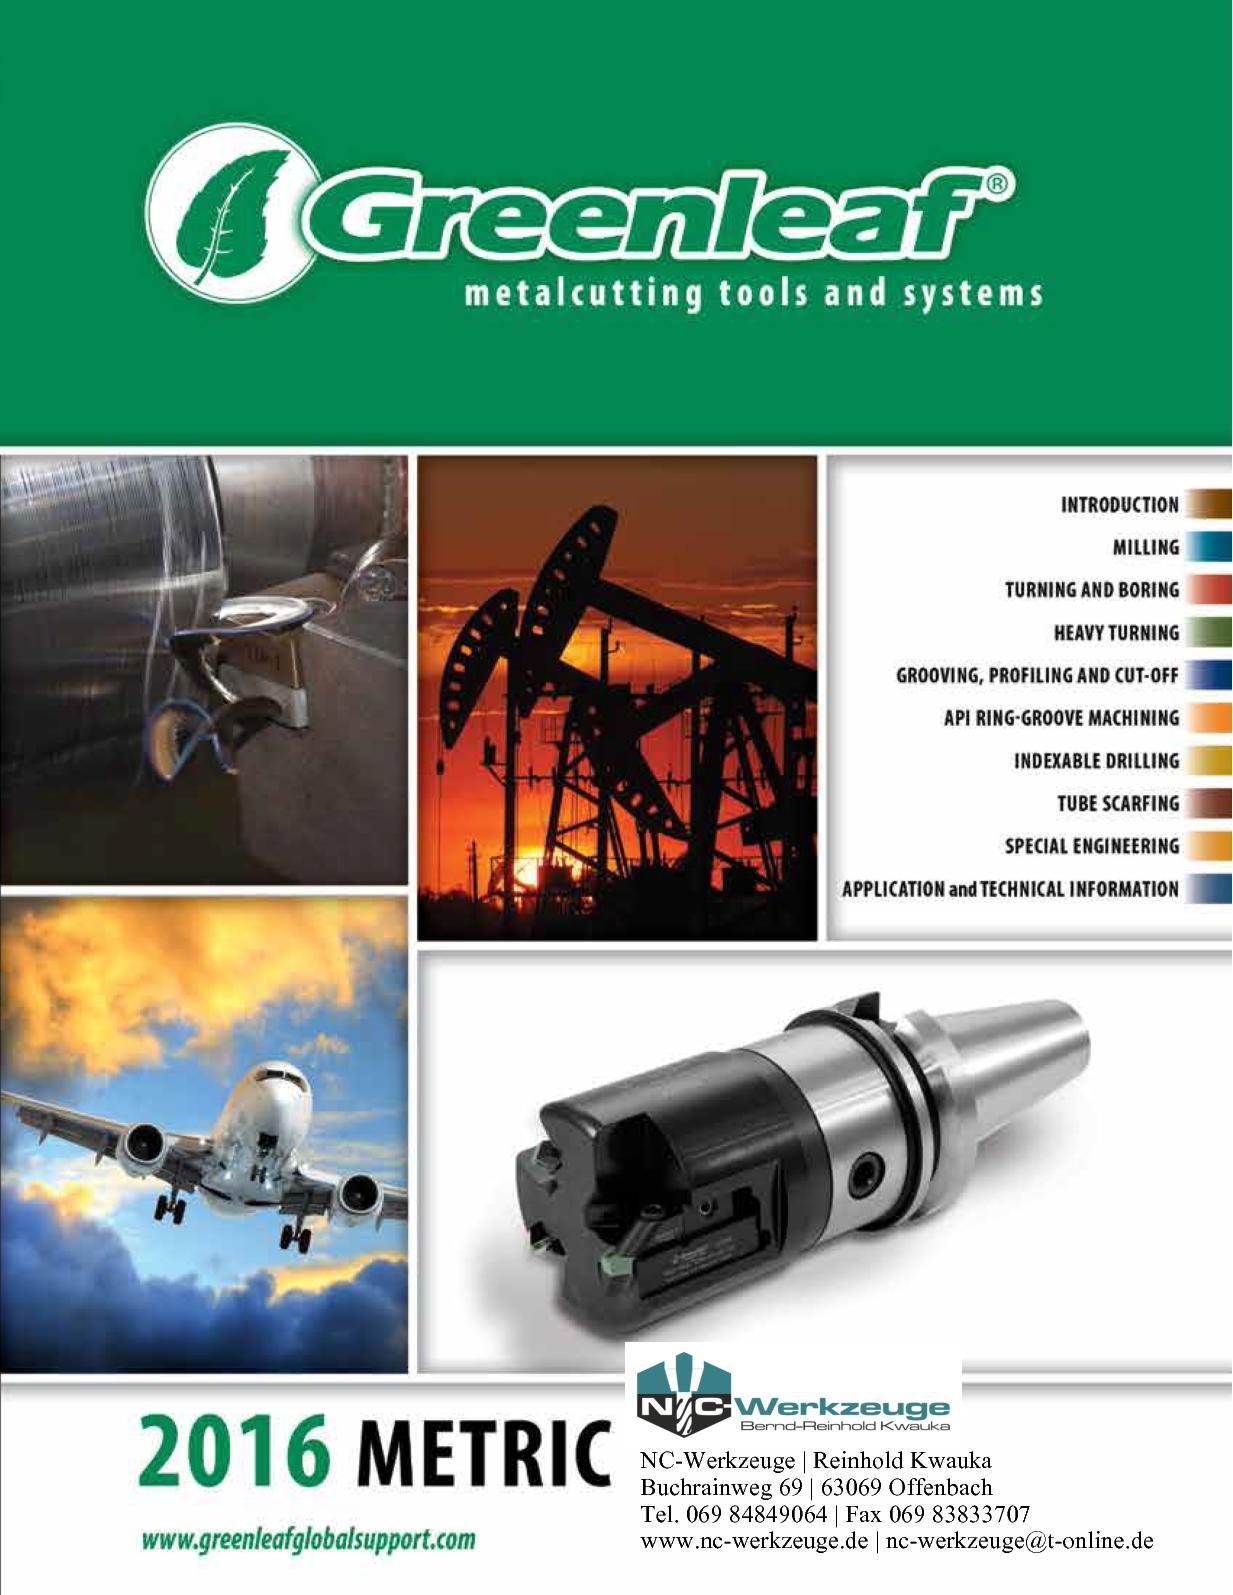 Greenleaf IRSN 43 carbide inserts 10 pcs.